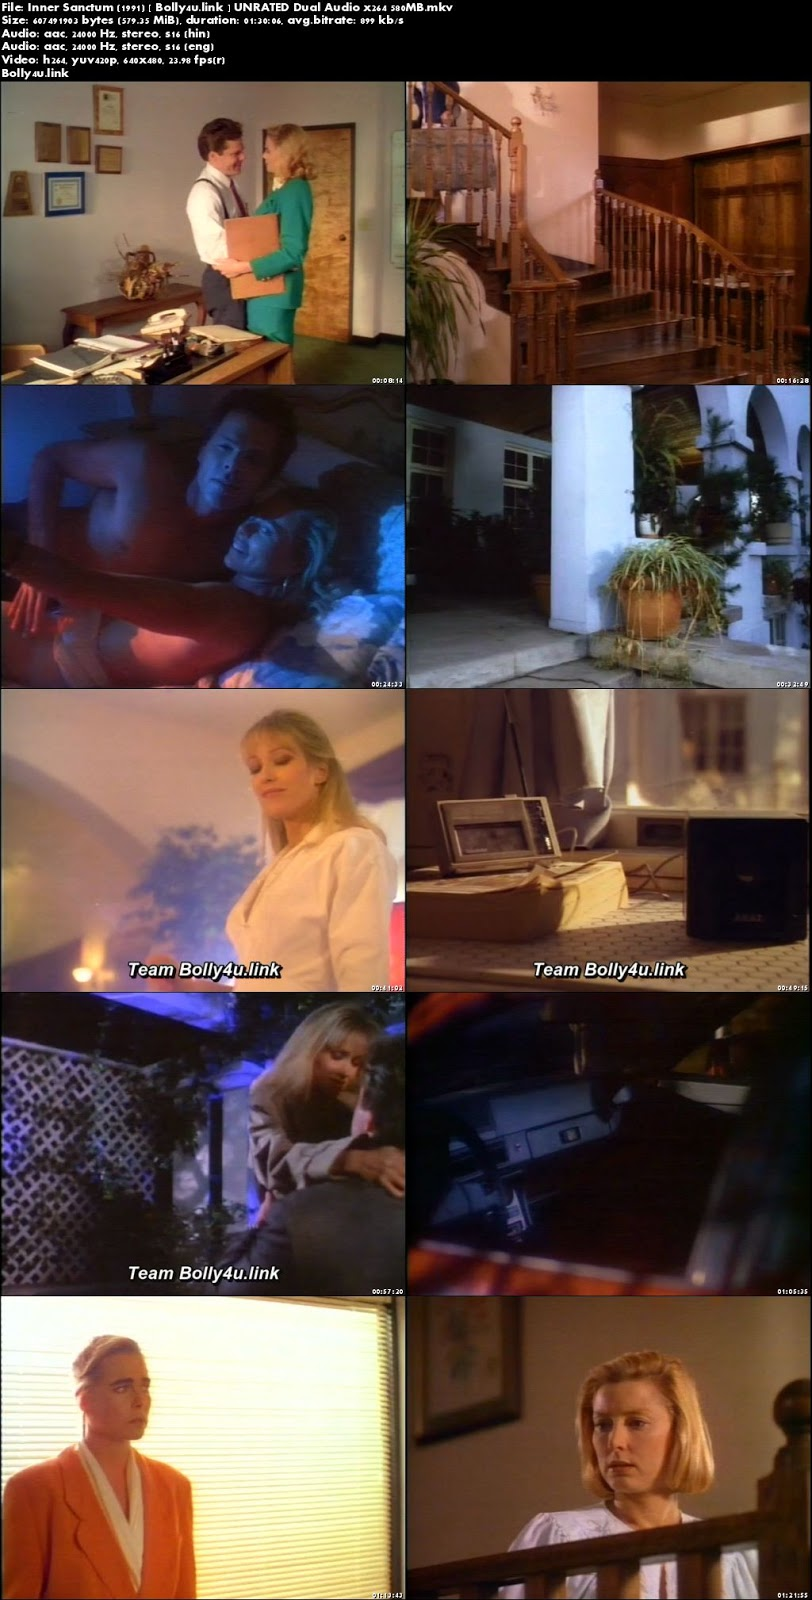 [18+] Inner Sanctum 1991 DVDRip 300MB UNRATED Hindi Dual Audio 480p Download